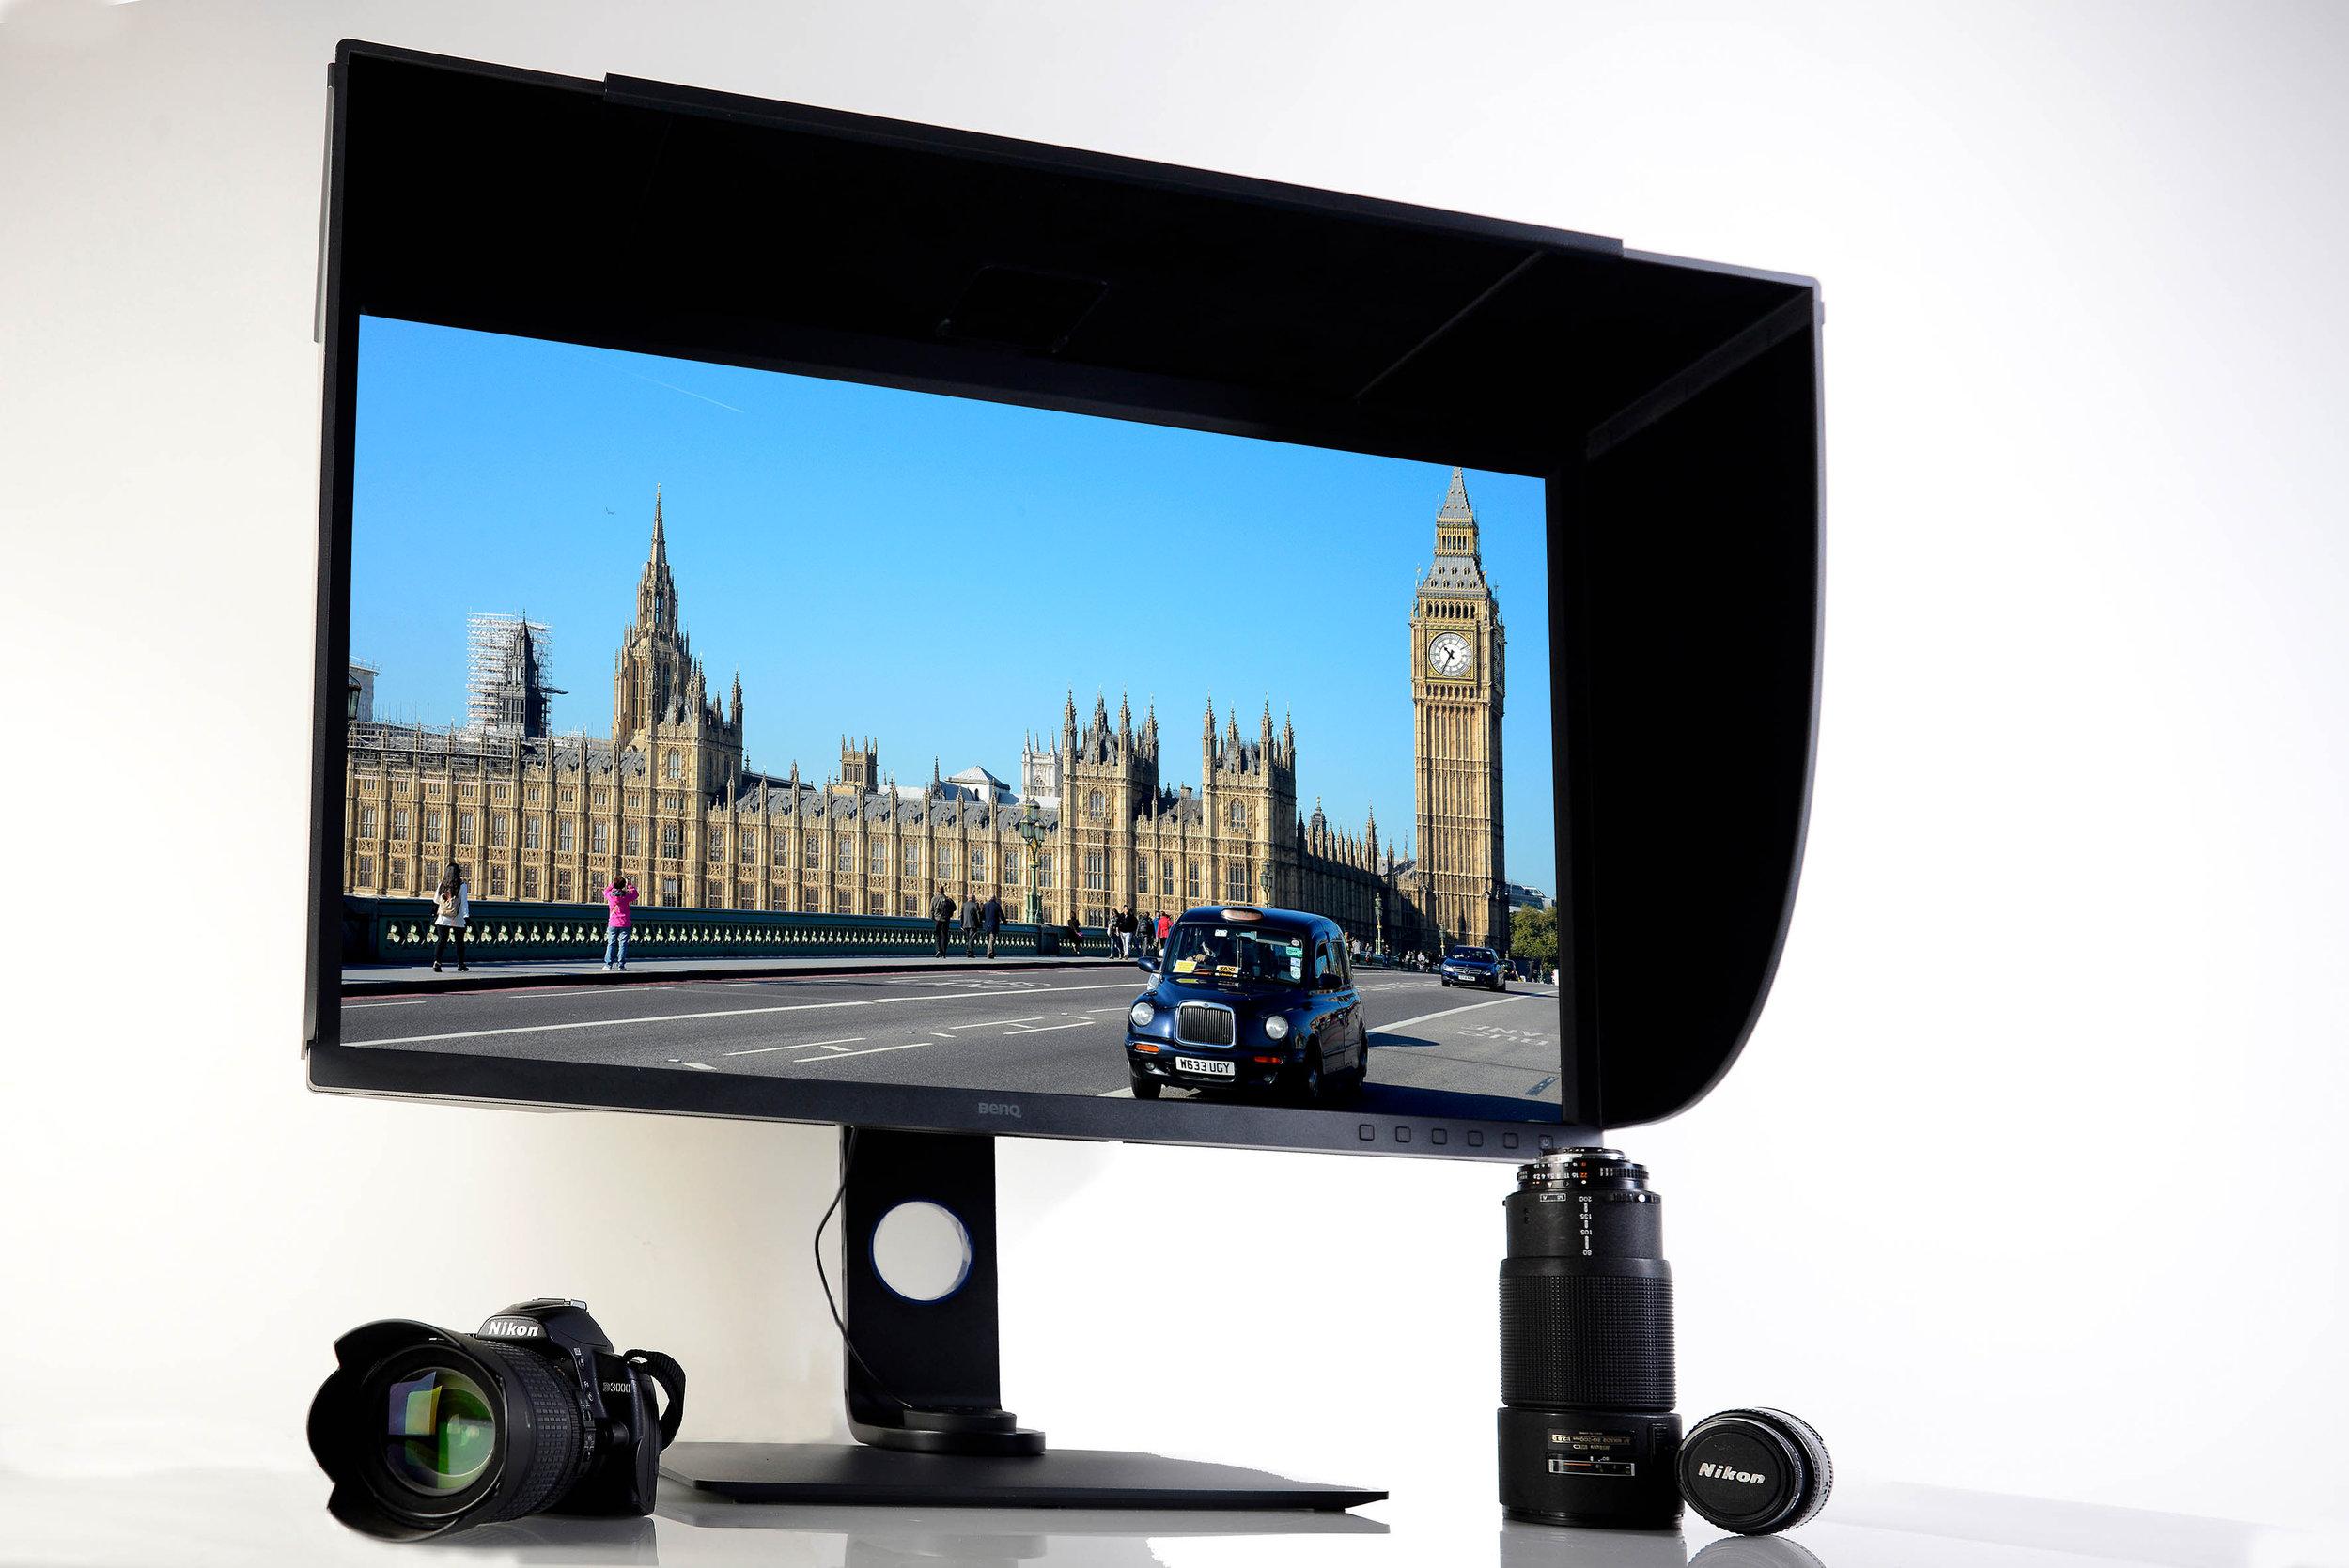 BenQ SW320 - Monitor mir Kamera - Foto Michael B. Rehders_MBR1298.jpg